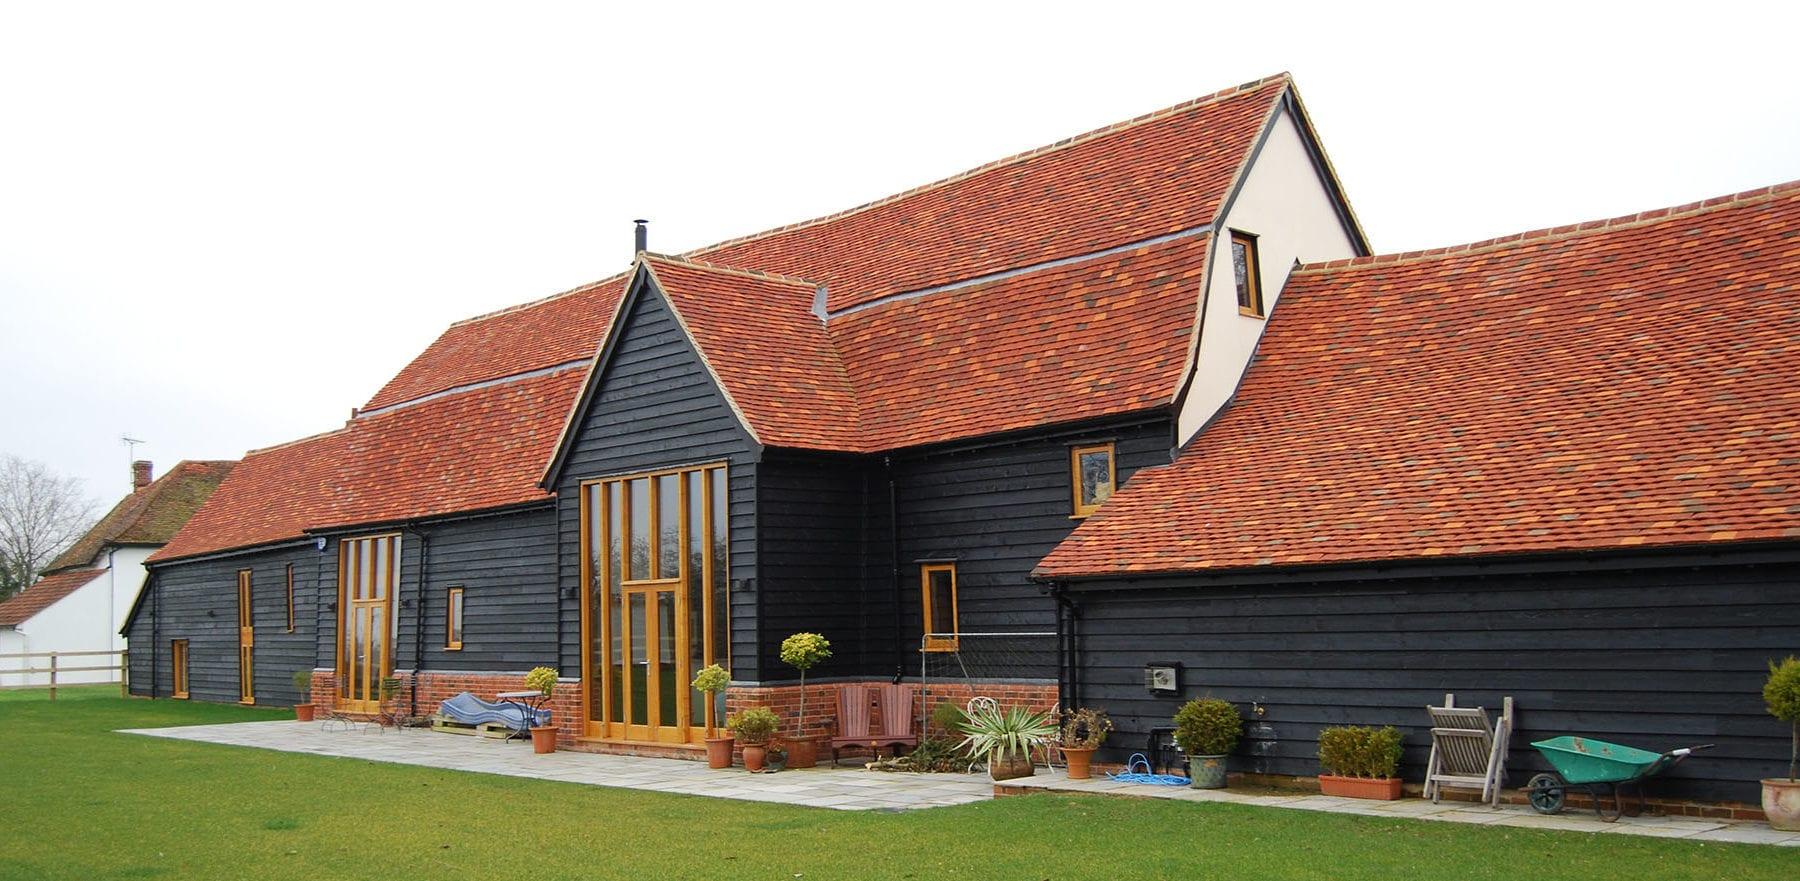 Lifestiles - Handmade Multi Clay Roof Tiles - Ford End, England 3